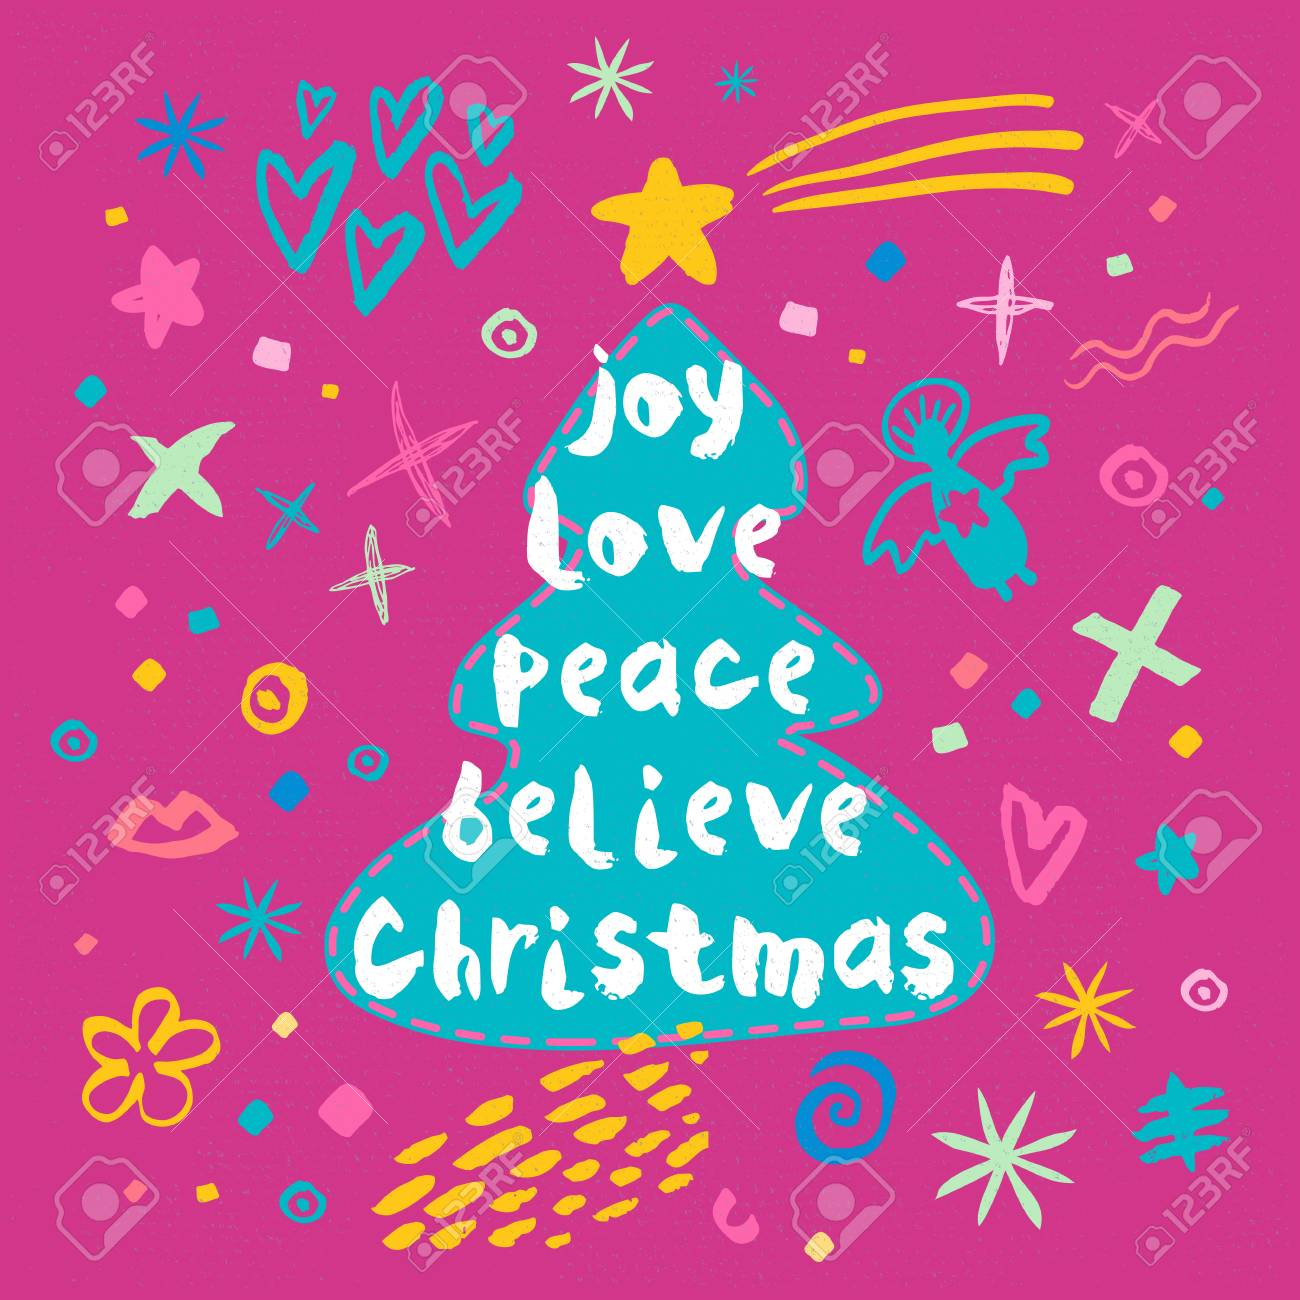 Joy Love Peace Believe Christmas Sketch Style. Christmas Lettering ...